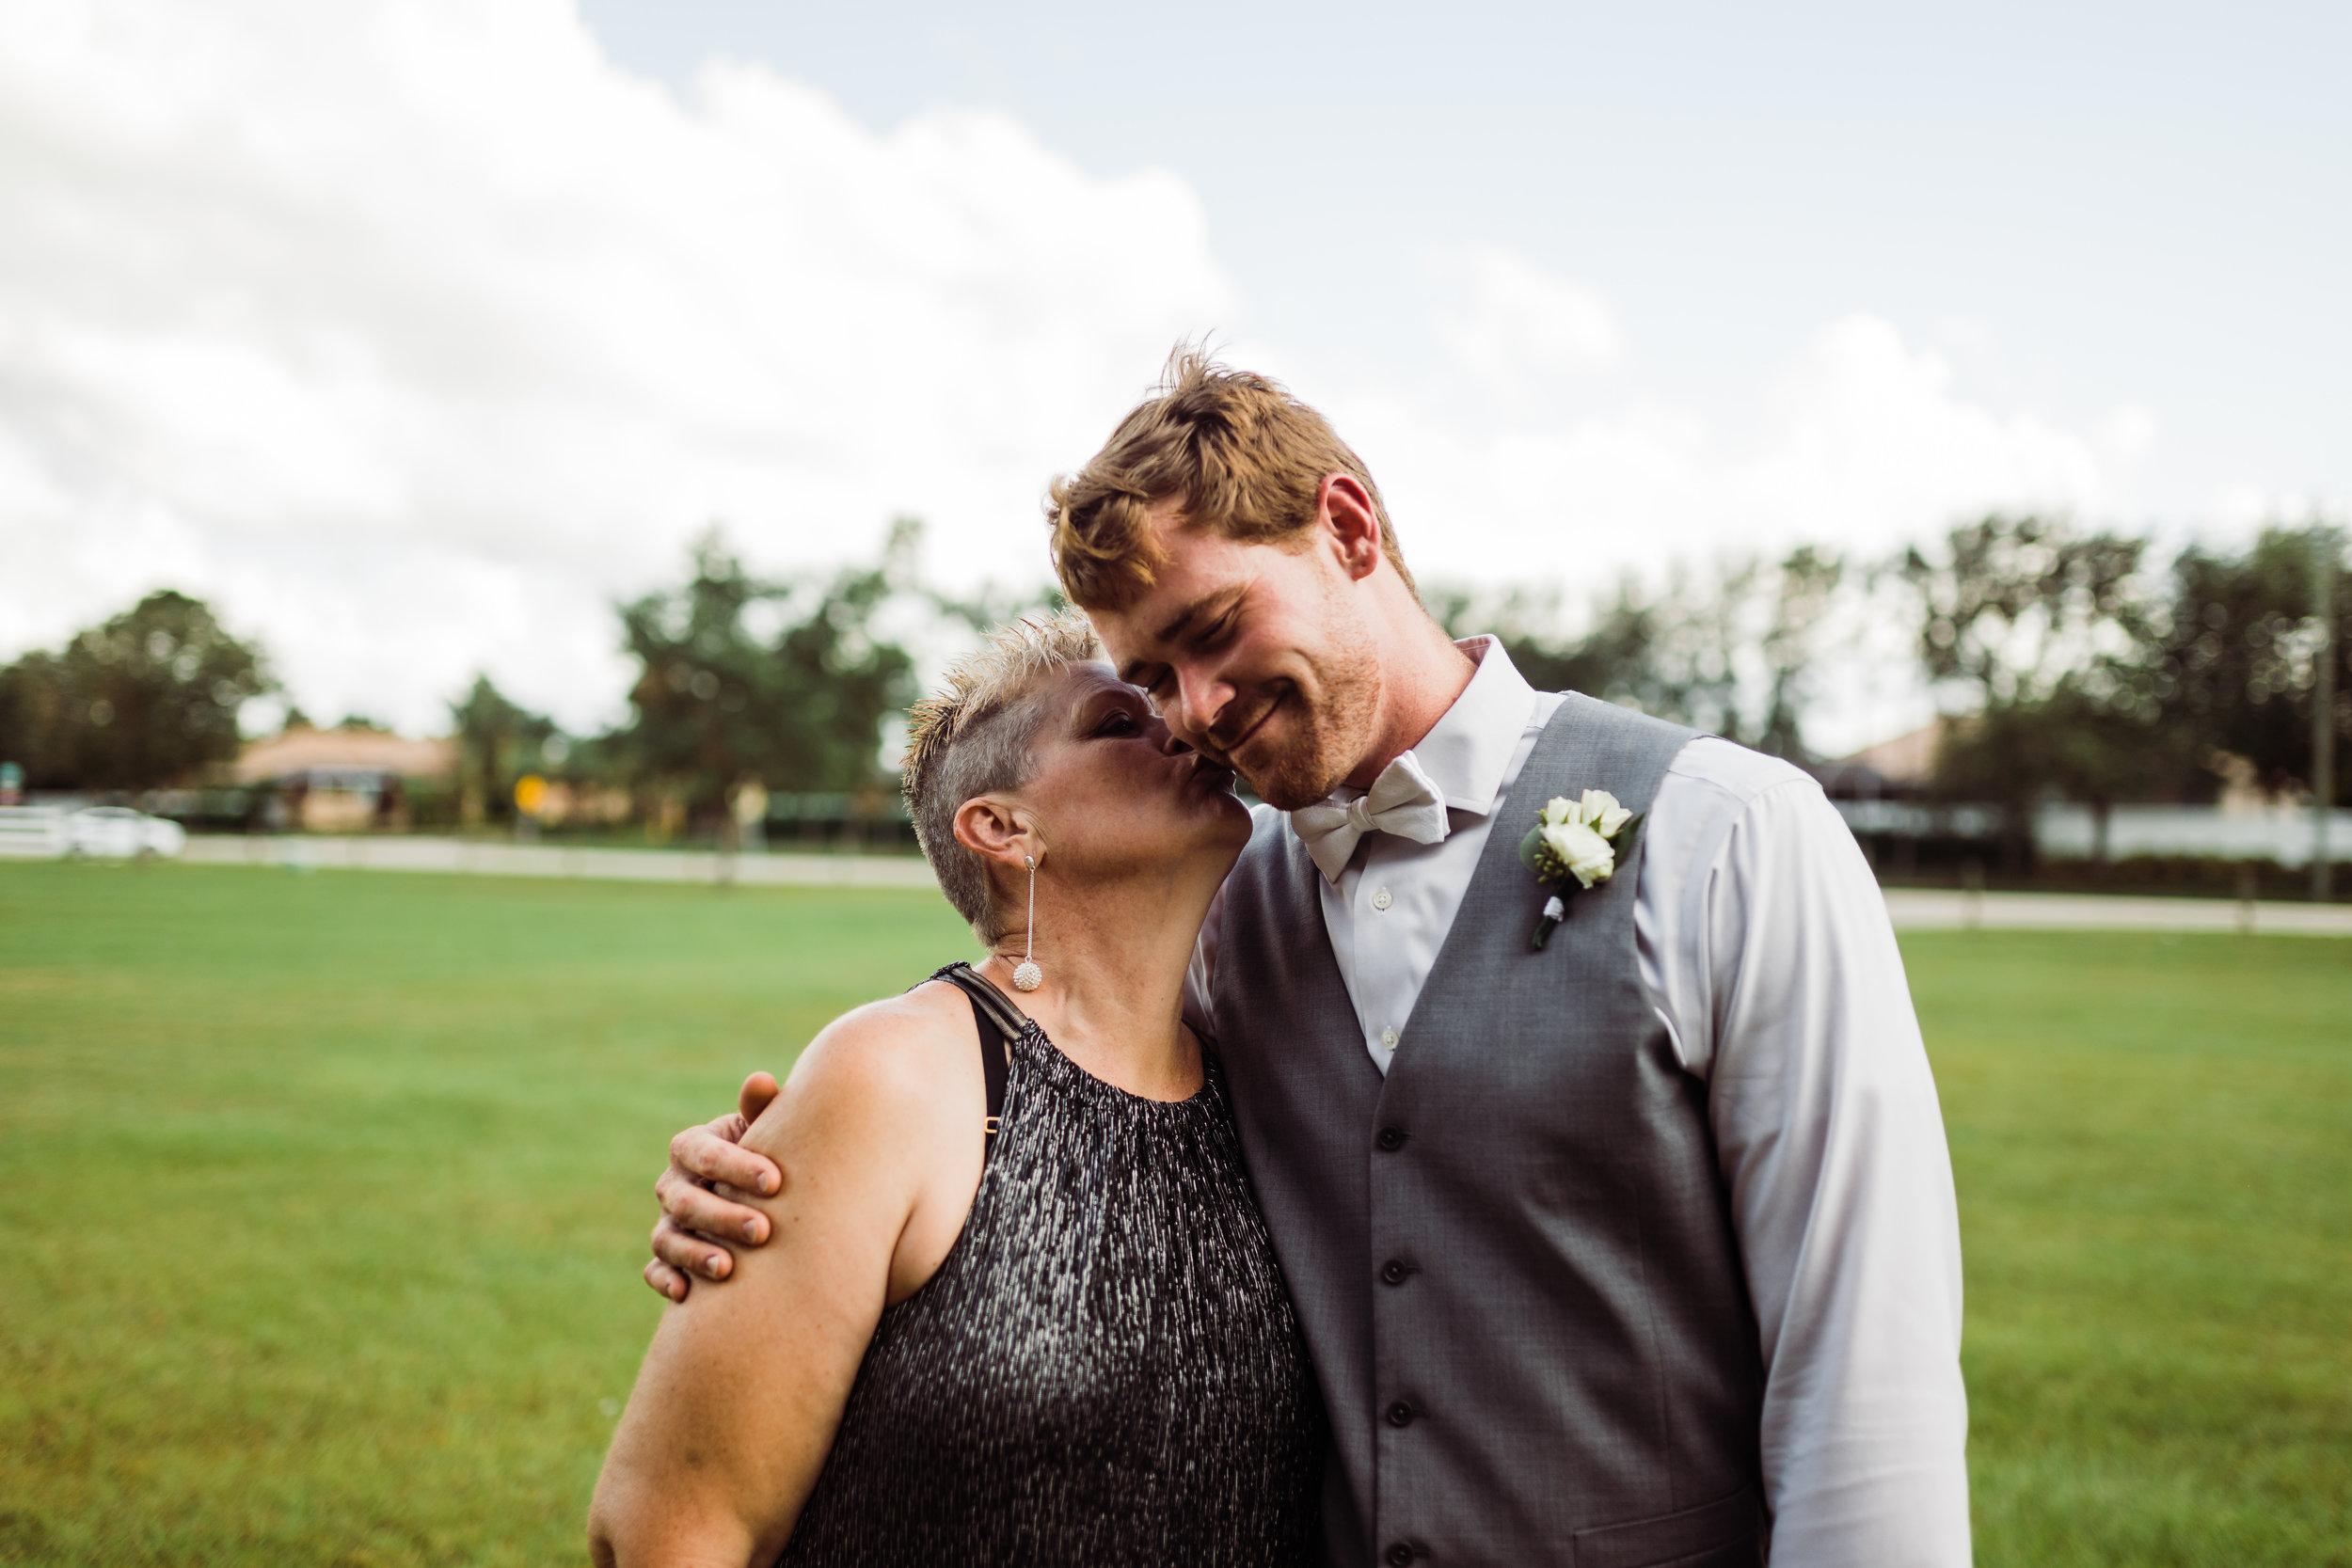 2017.10.14 Samantha and Matthew Crabtree Sarasota Wedding (226 of 708).jpg